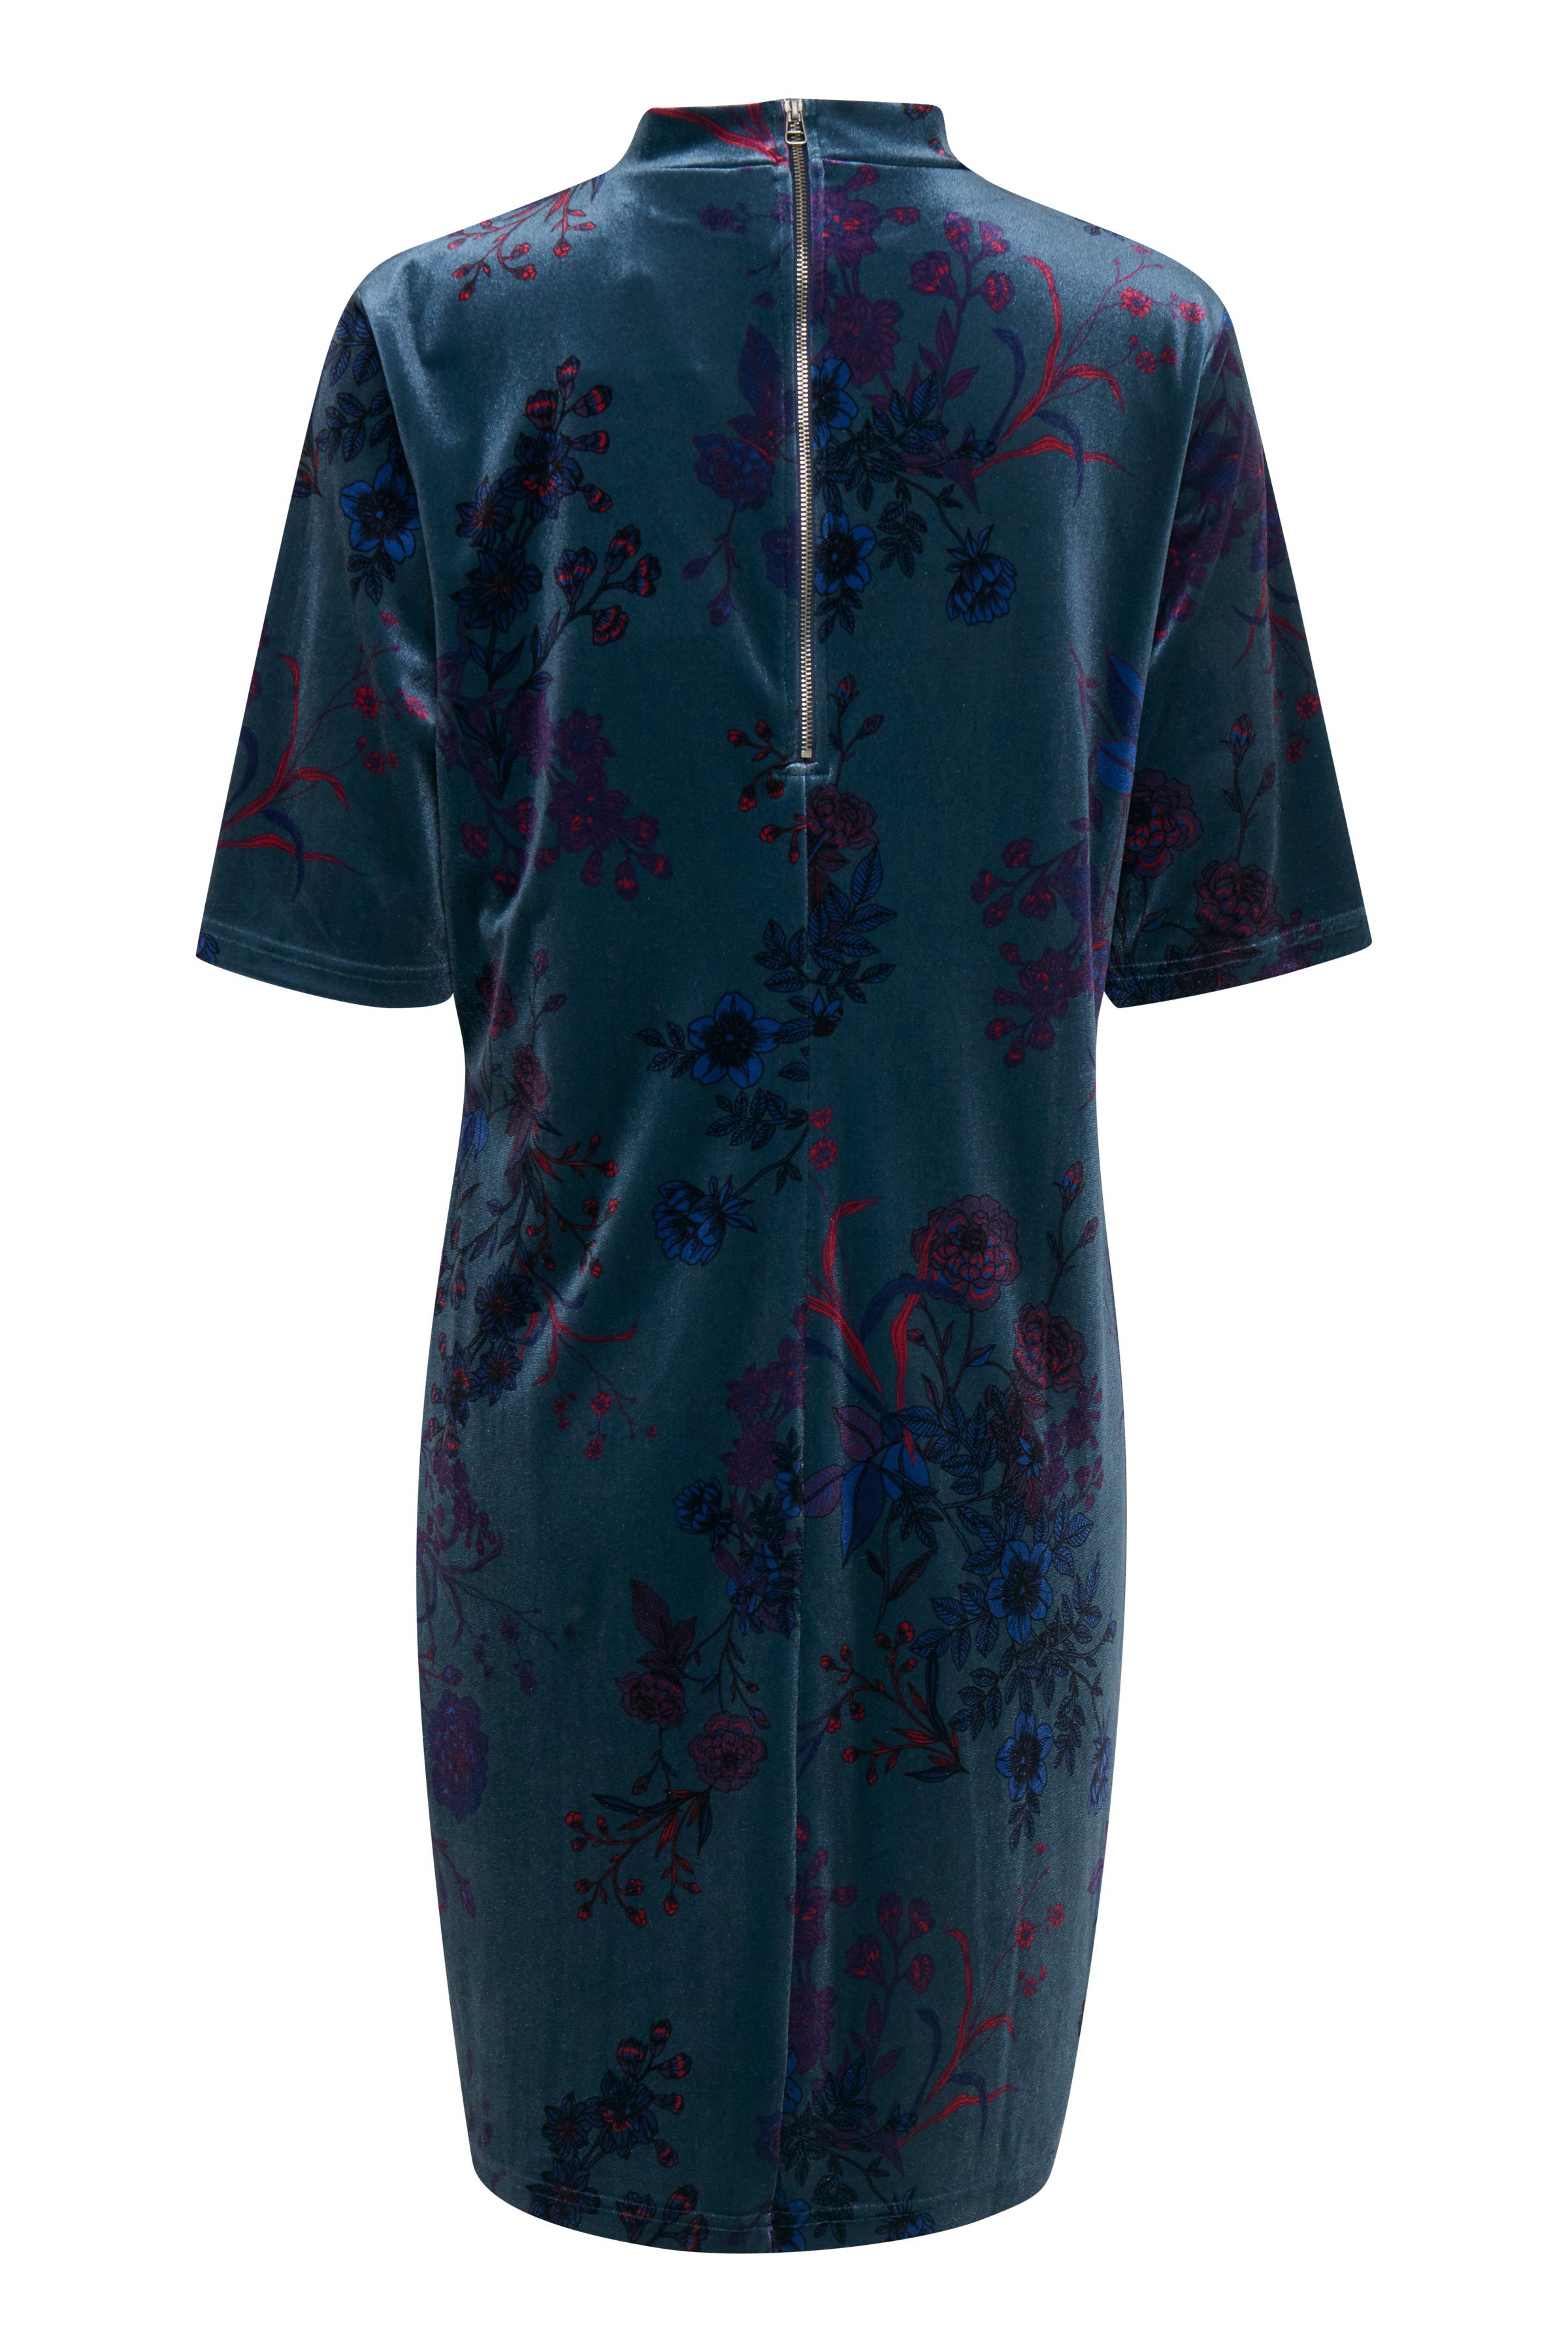 Copenhagen night combi Jersey kjole fra b.young - Kjøp Copenhagen night combi Jersey kjole fra størrelse XS-XXL her